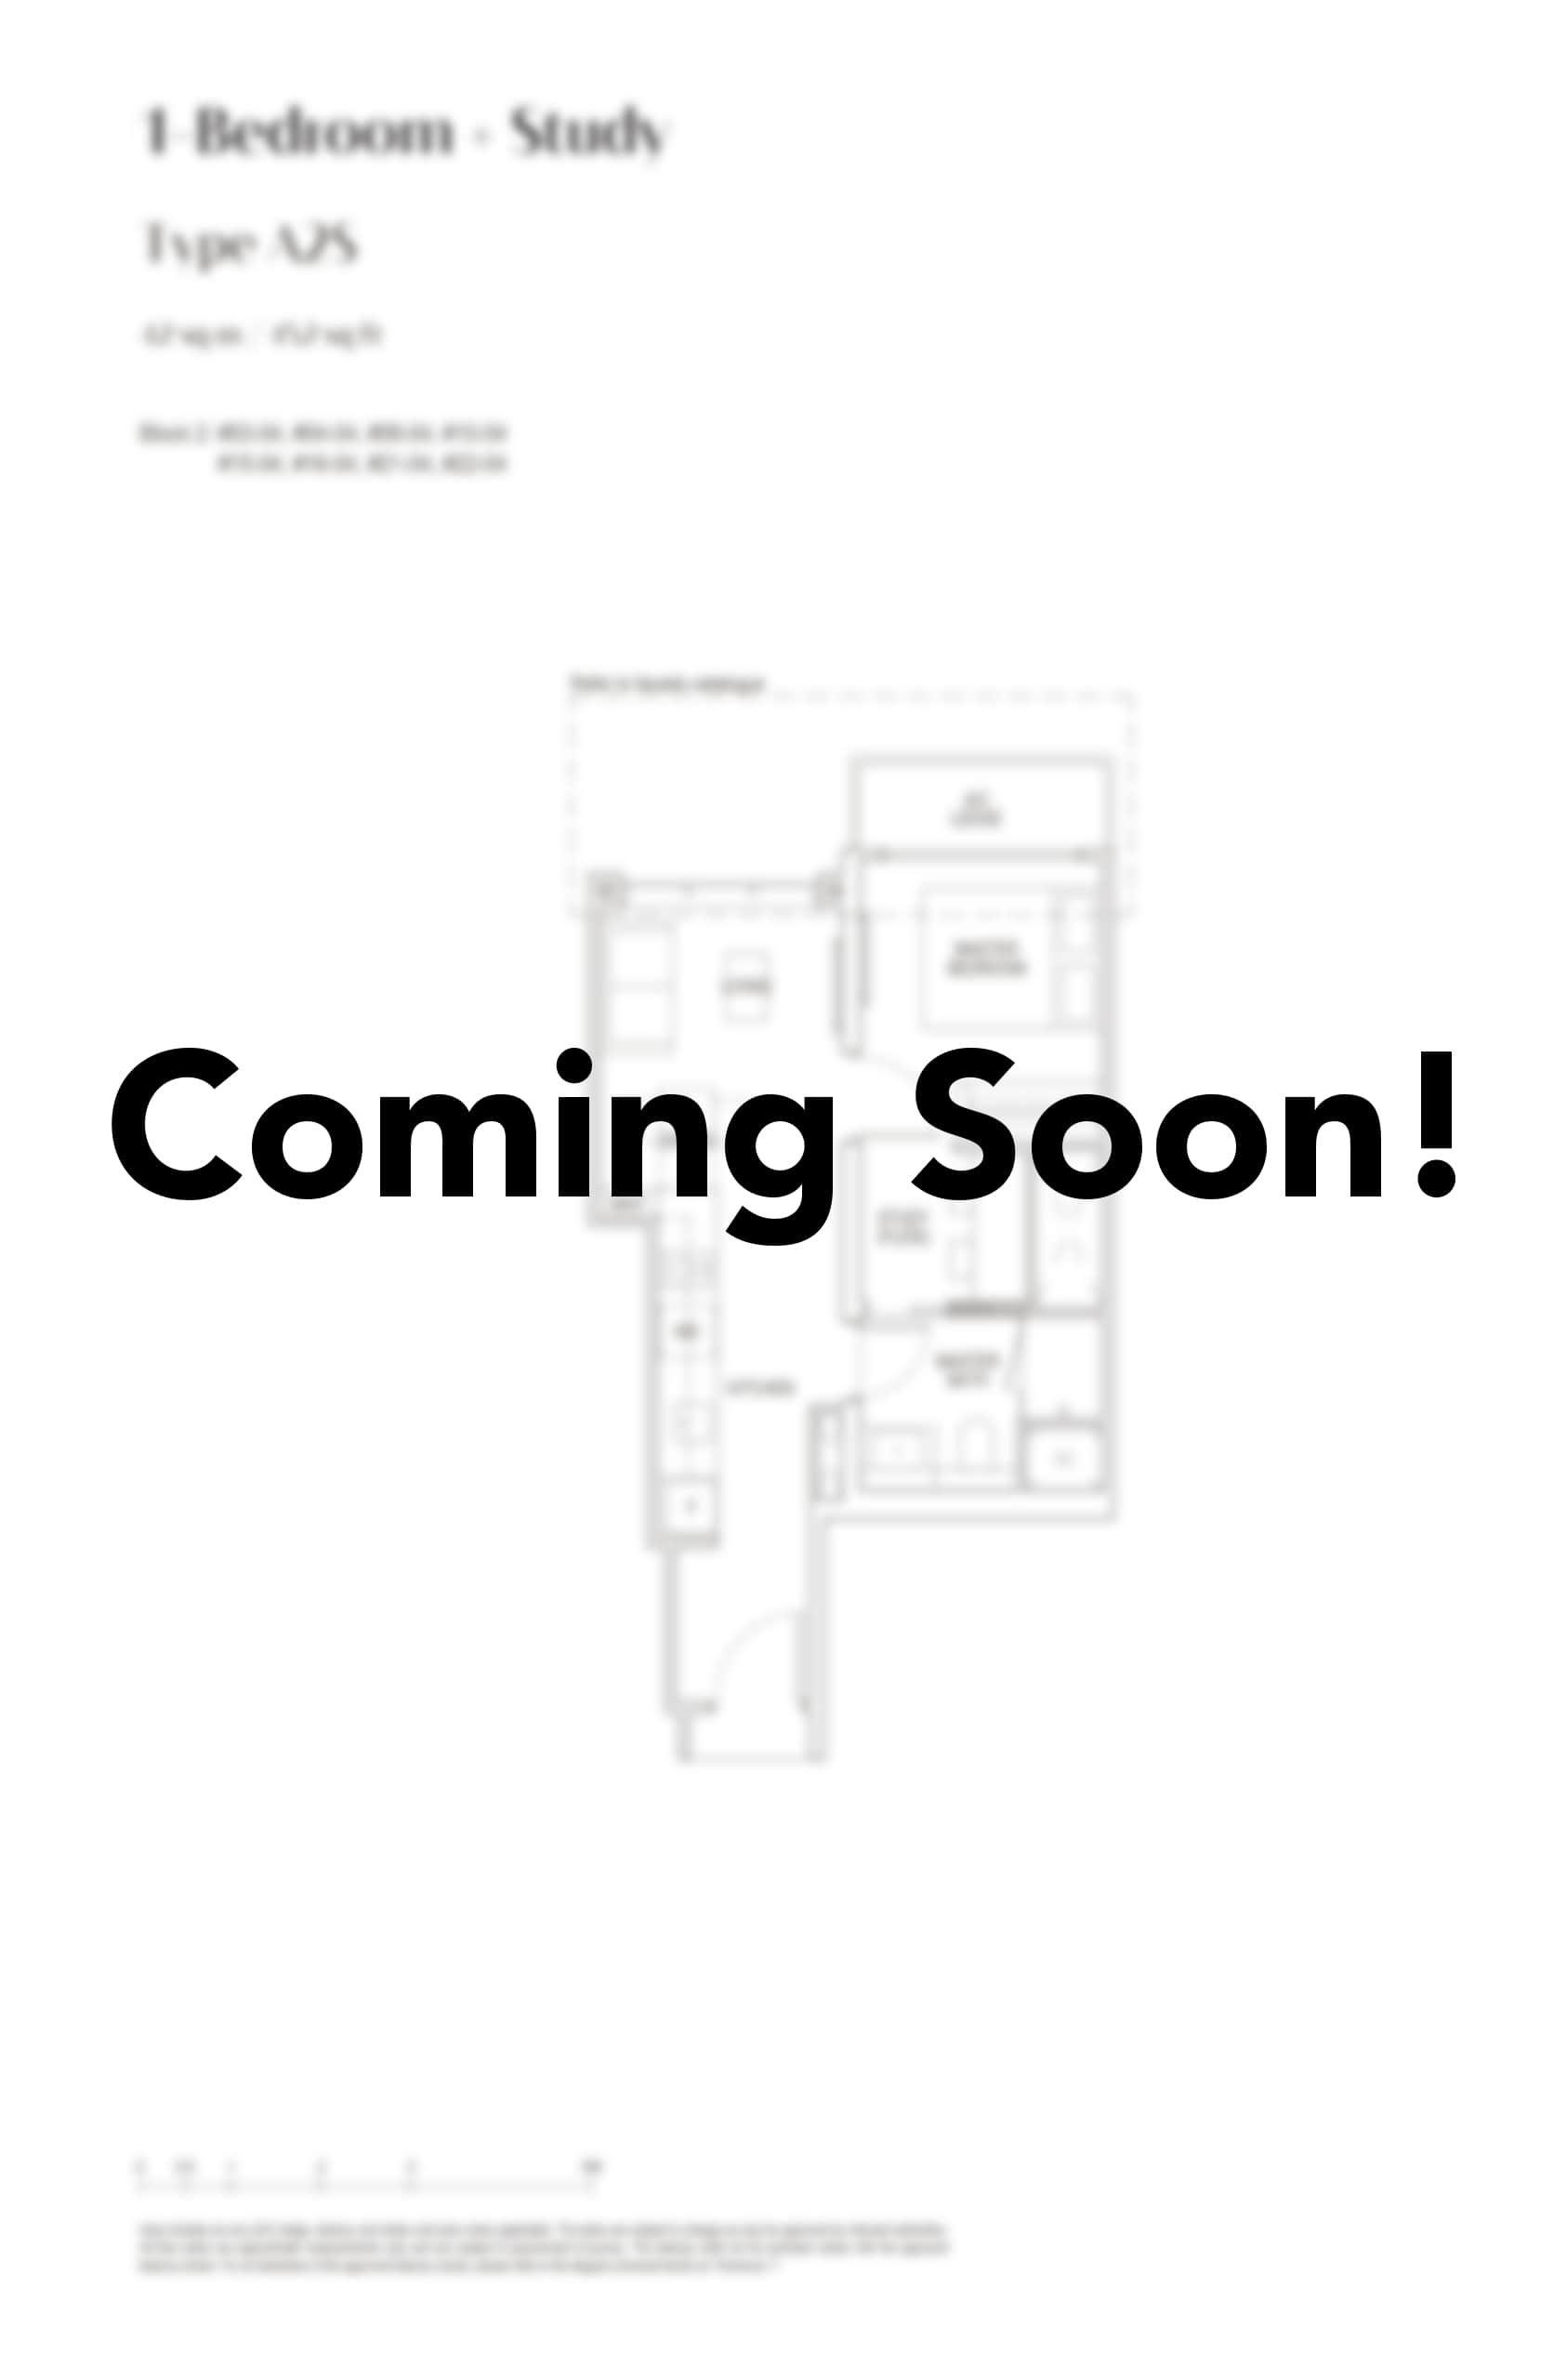 pasir ris 8 Floor Plan 1 Bedroom study A2S